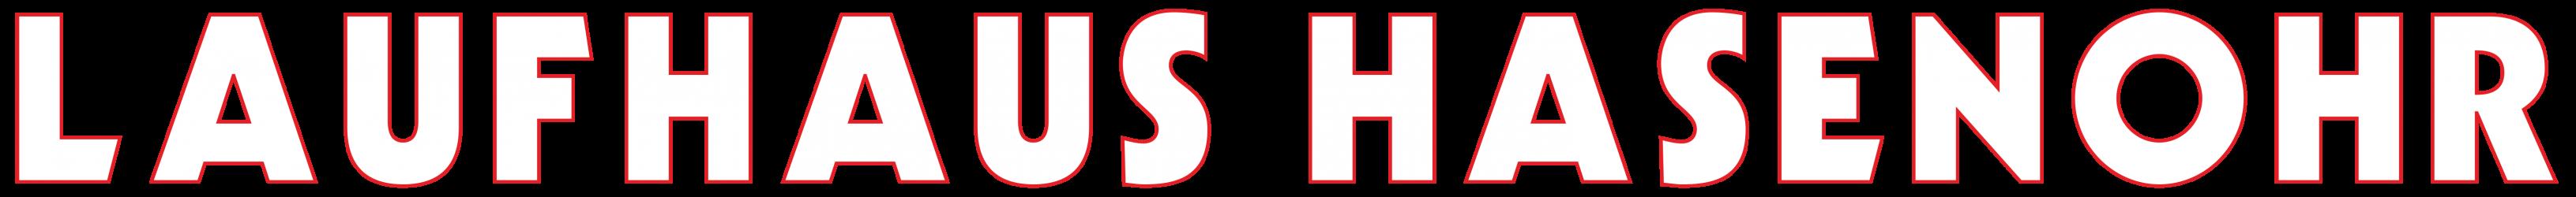 Laufhaus Hasenohr